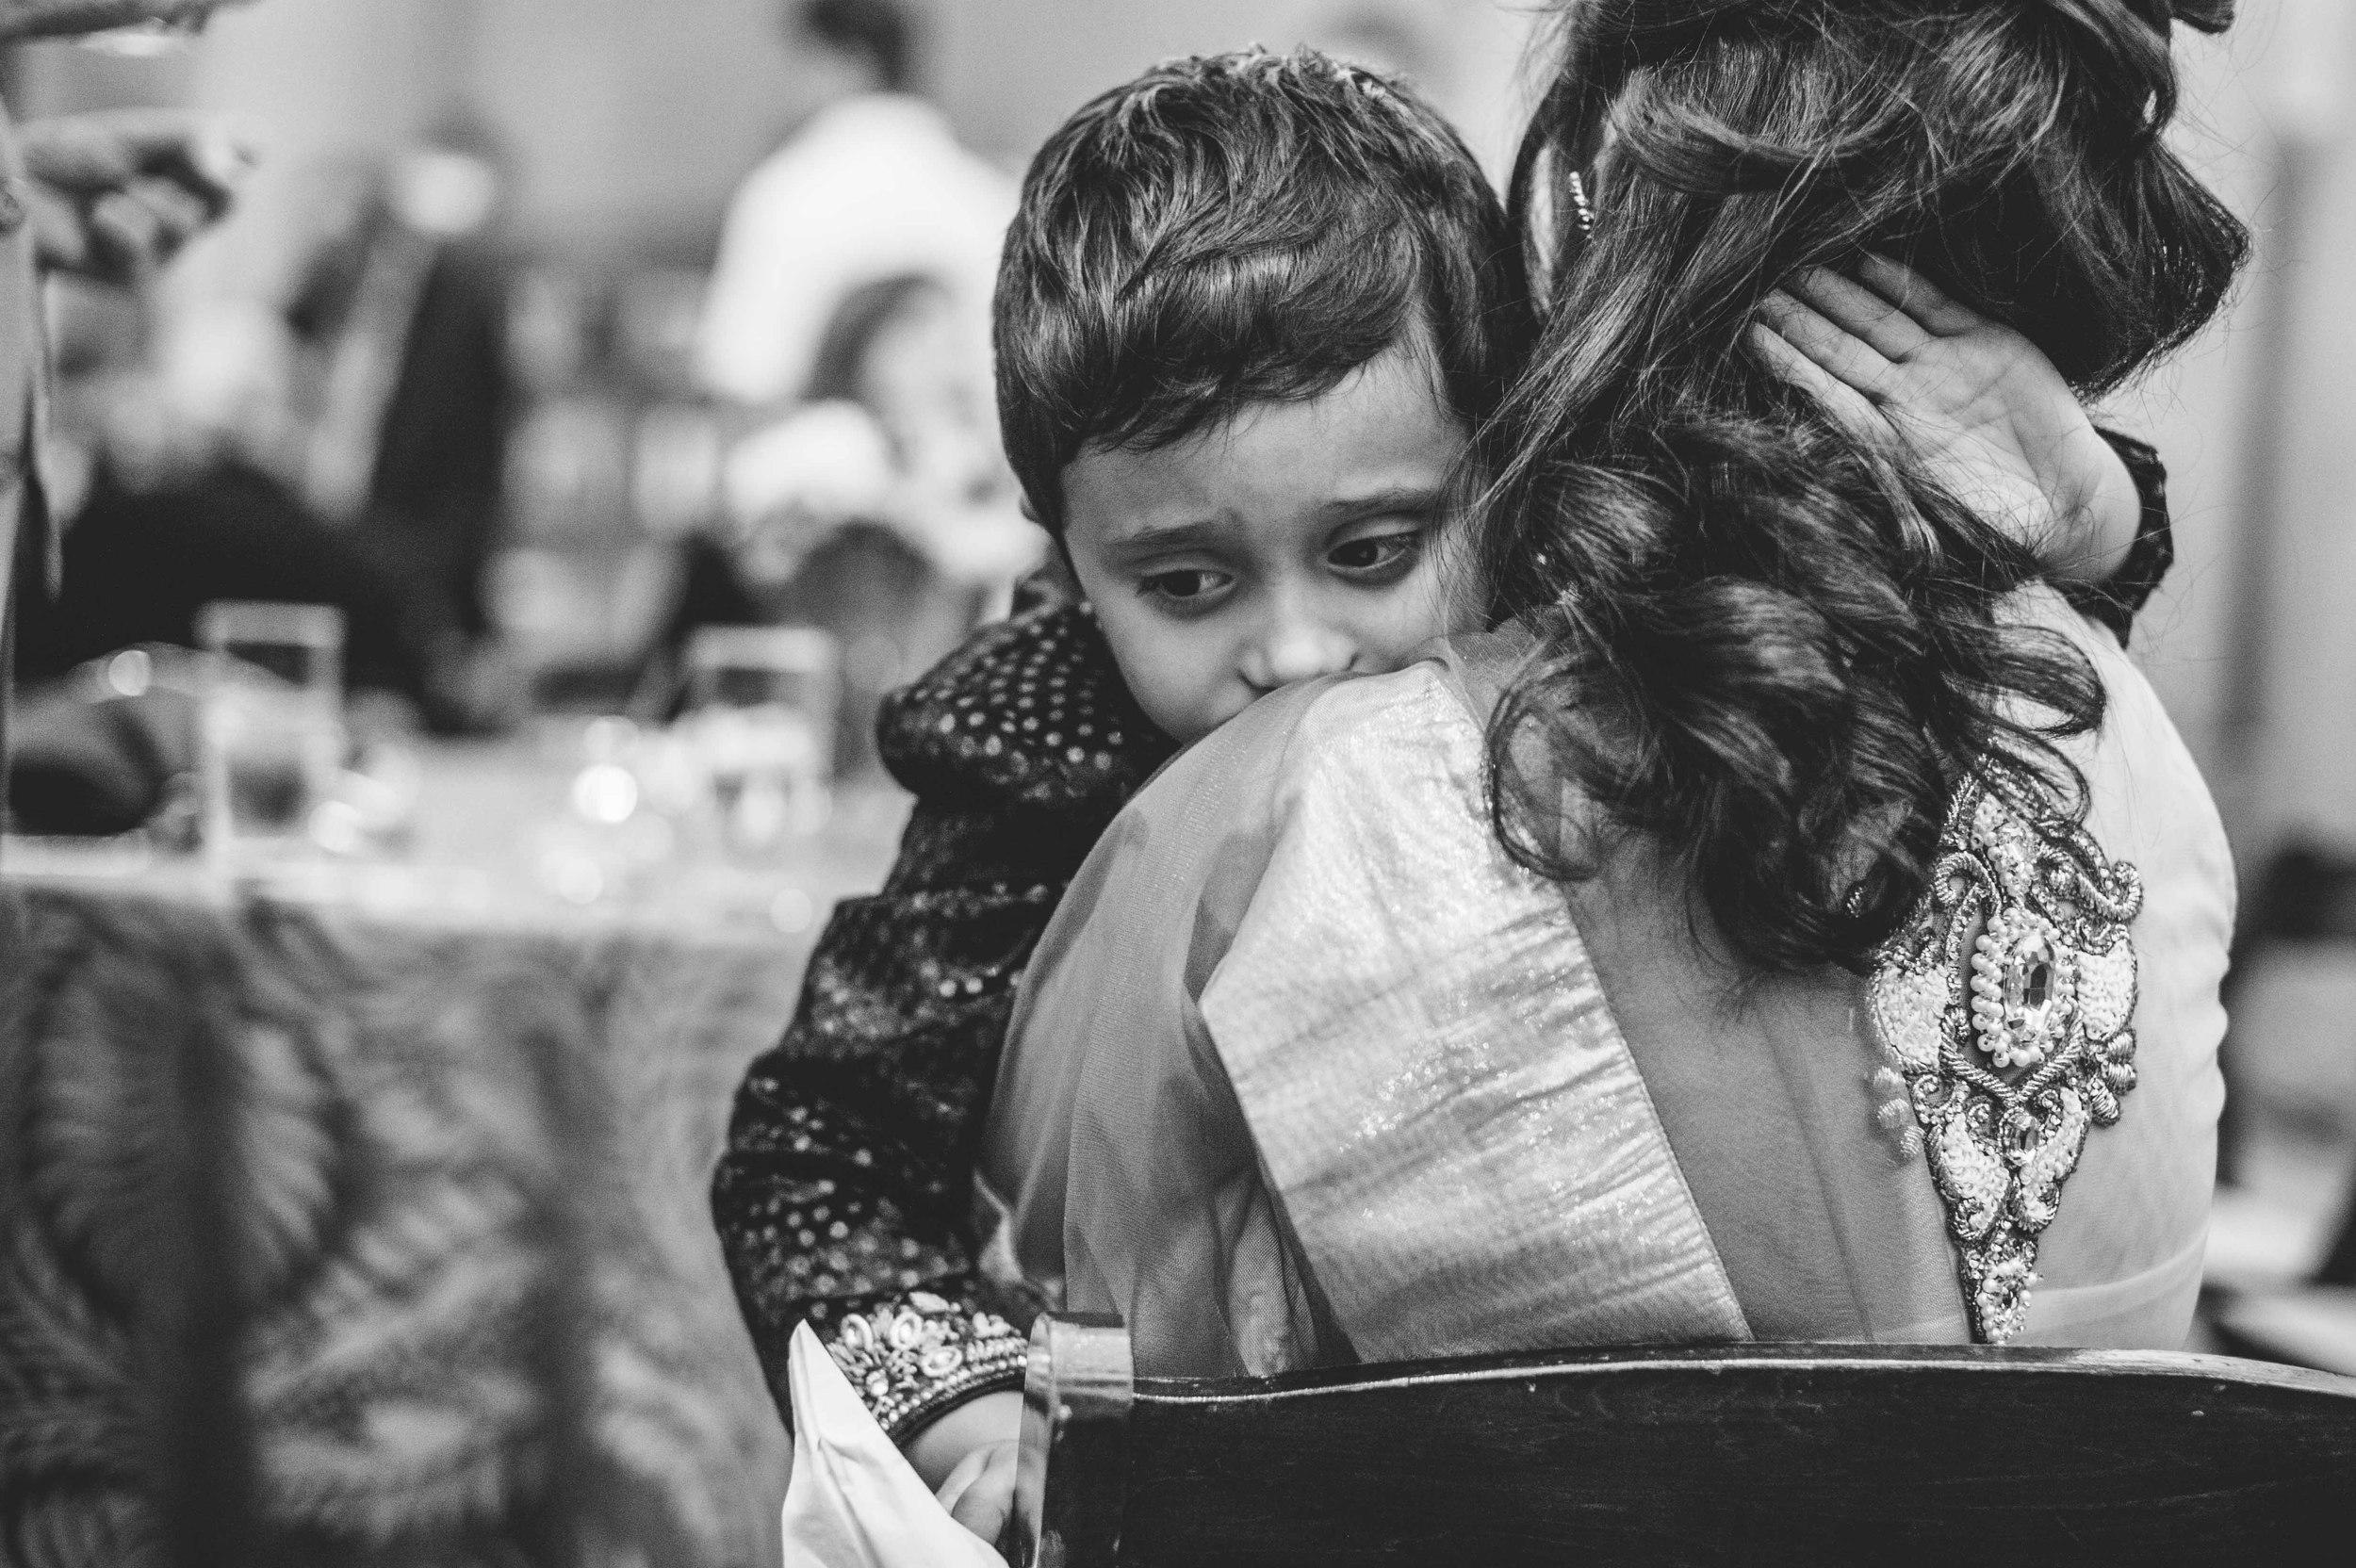 Indian Pre-wedding  at Arena Stage Washington DC by Mantas Kubilinskas-22.jpg